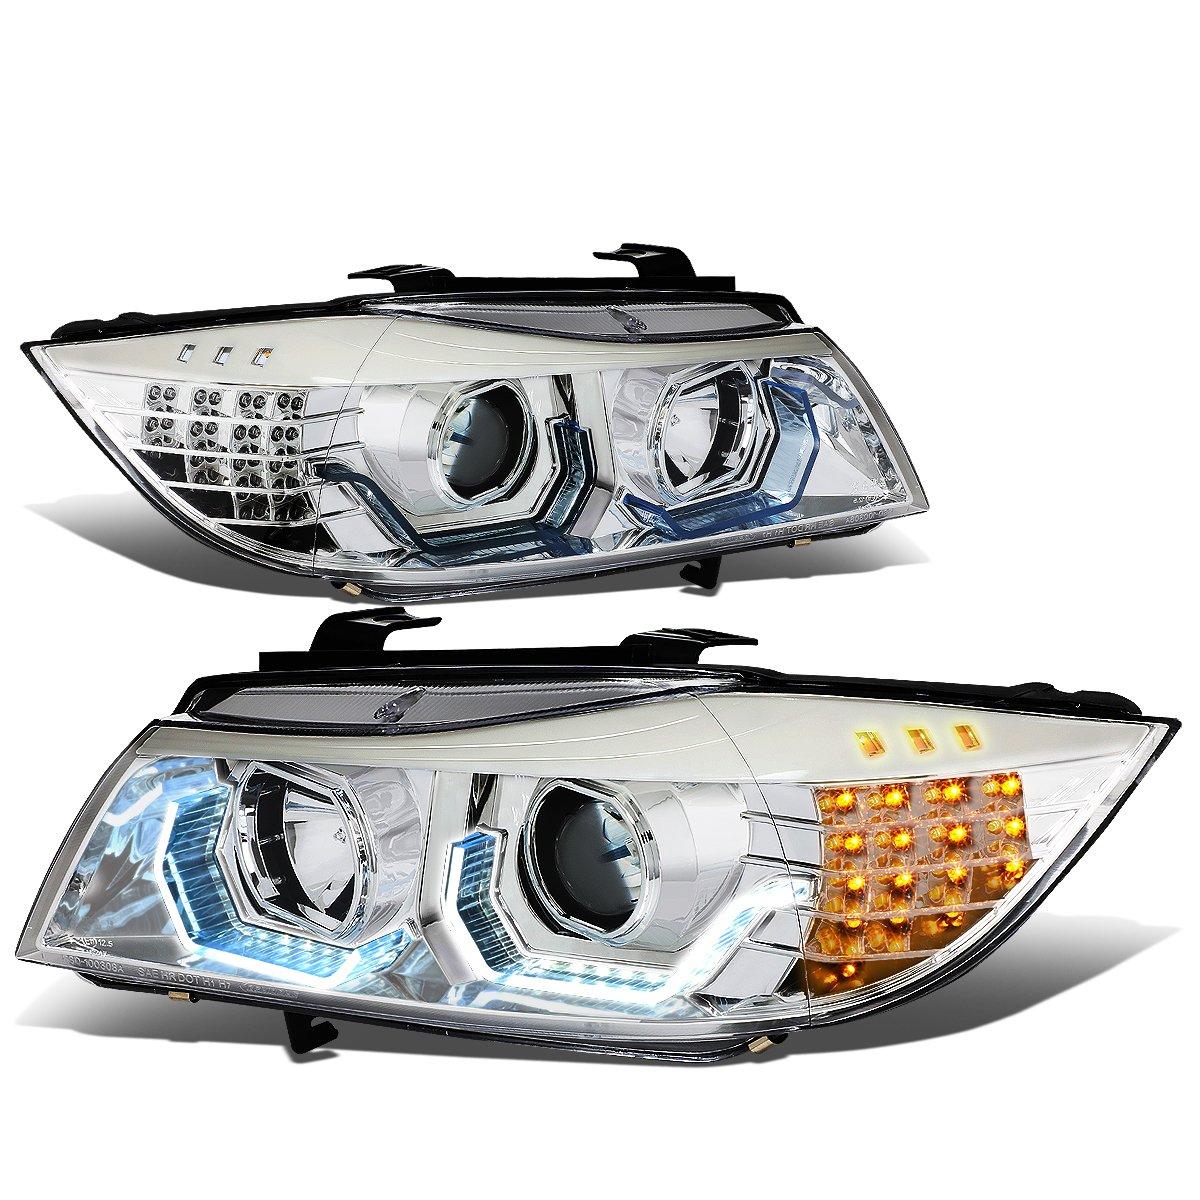 06-08 BMW E90 DNA Motoring Chrome Housing White HL-3D-E9005-CH-NEW 3D Halo Angle Eye Projector Headlight Black